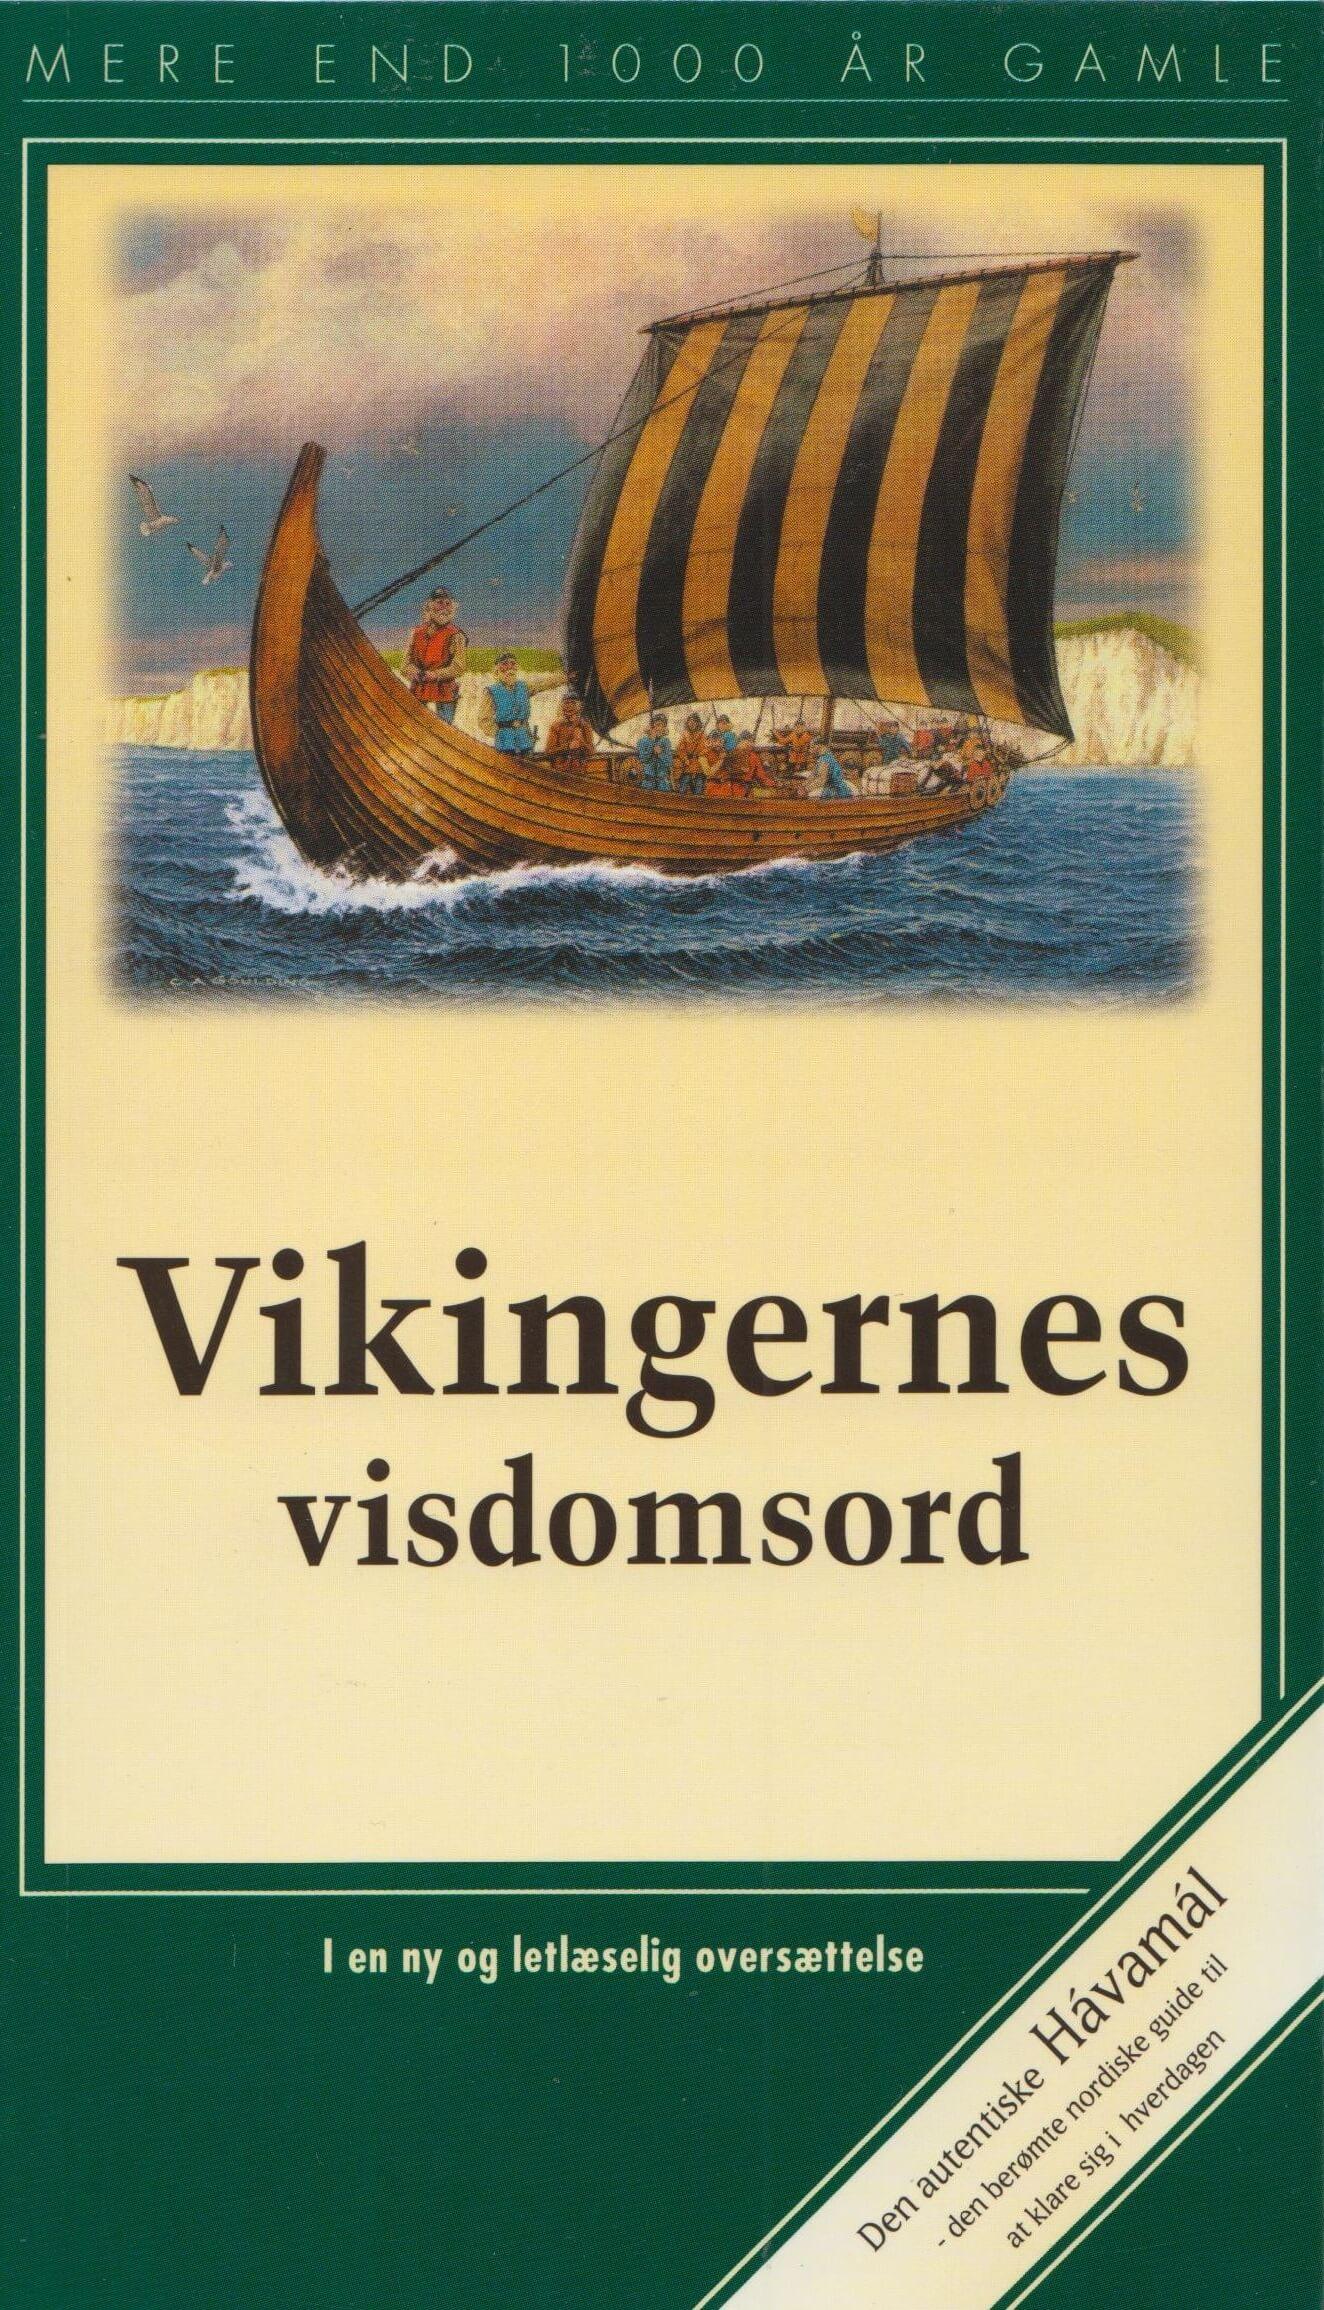 Vikingernes visdomsord - dansk